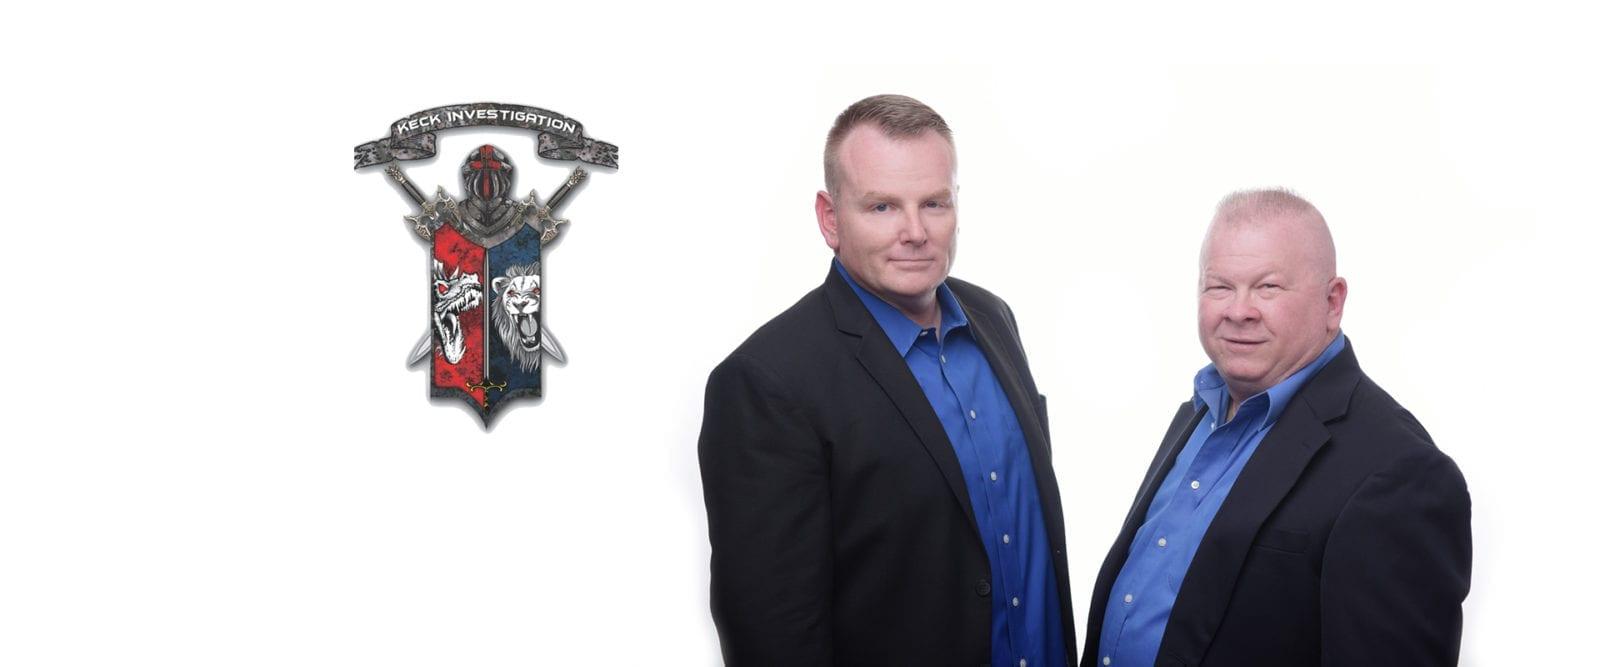 David Keck & Mark Lynn | Private Investigators | Keck Investigation Service, LLC